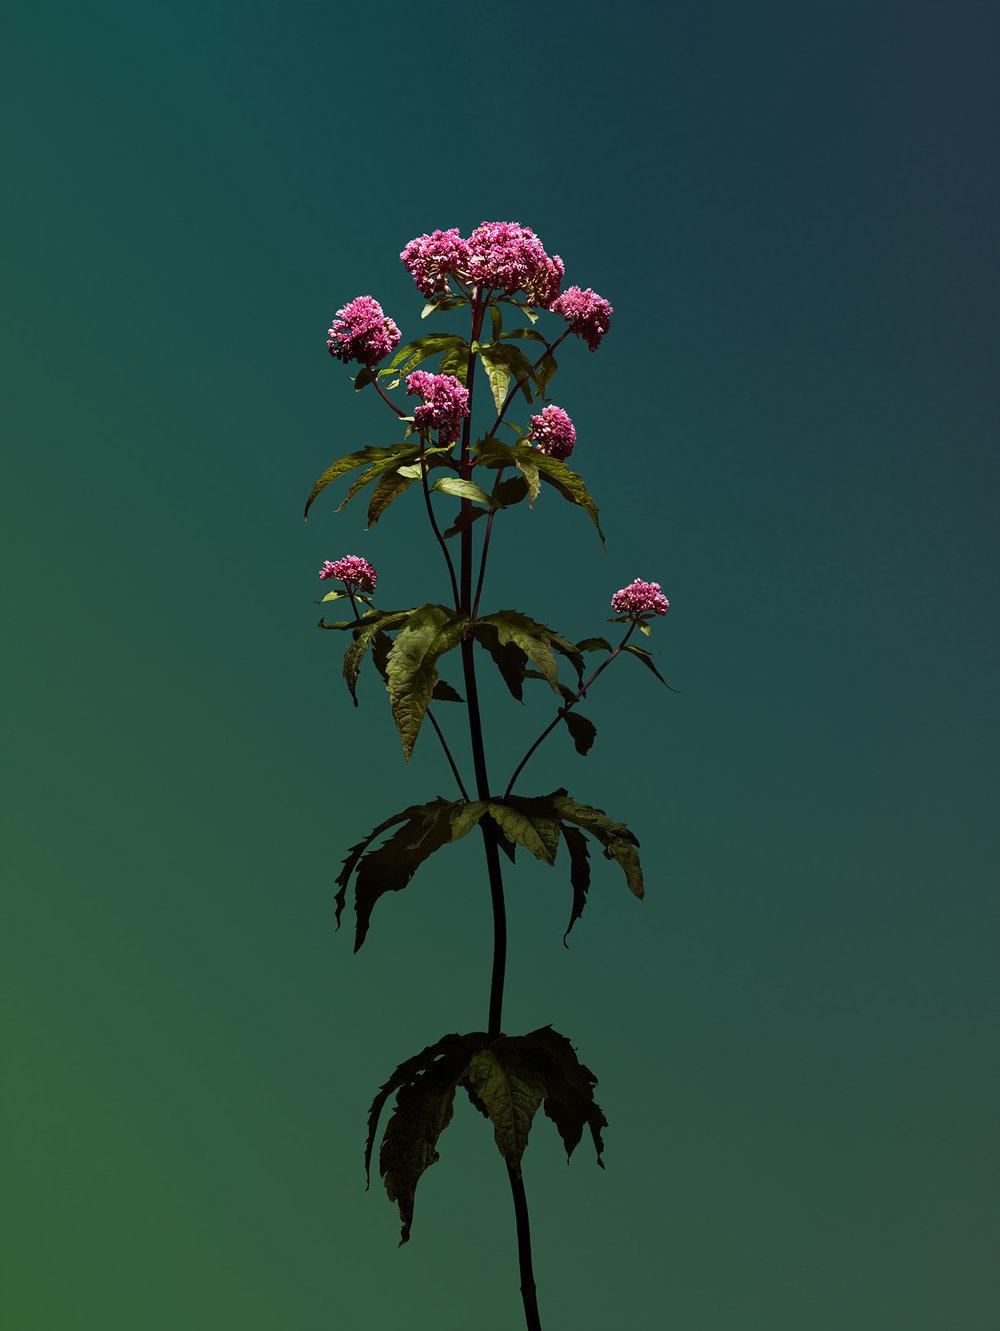 flowerb.jpg